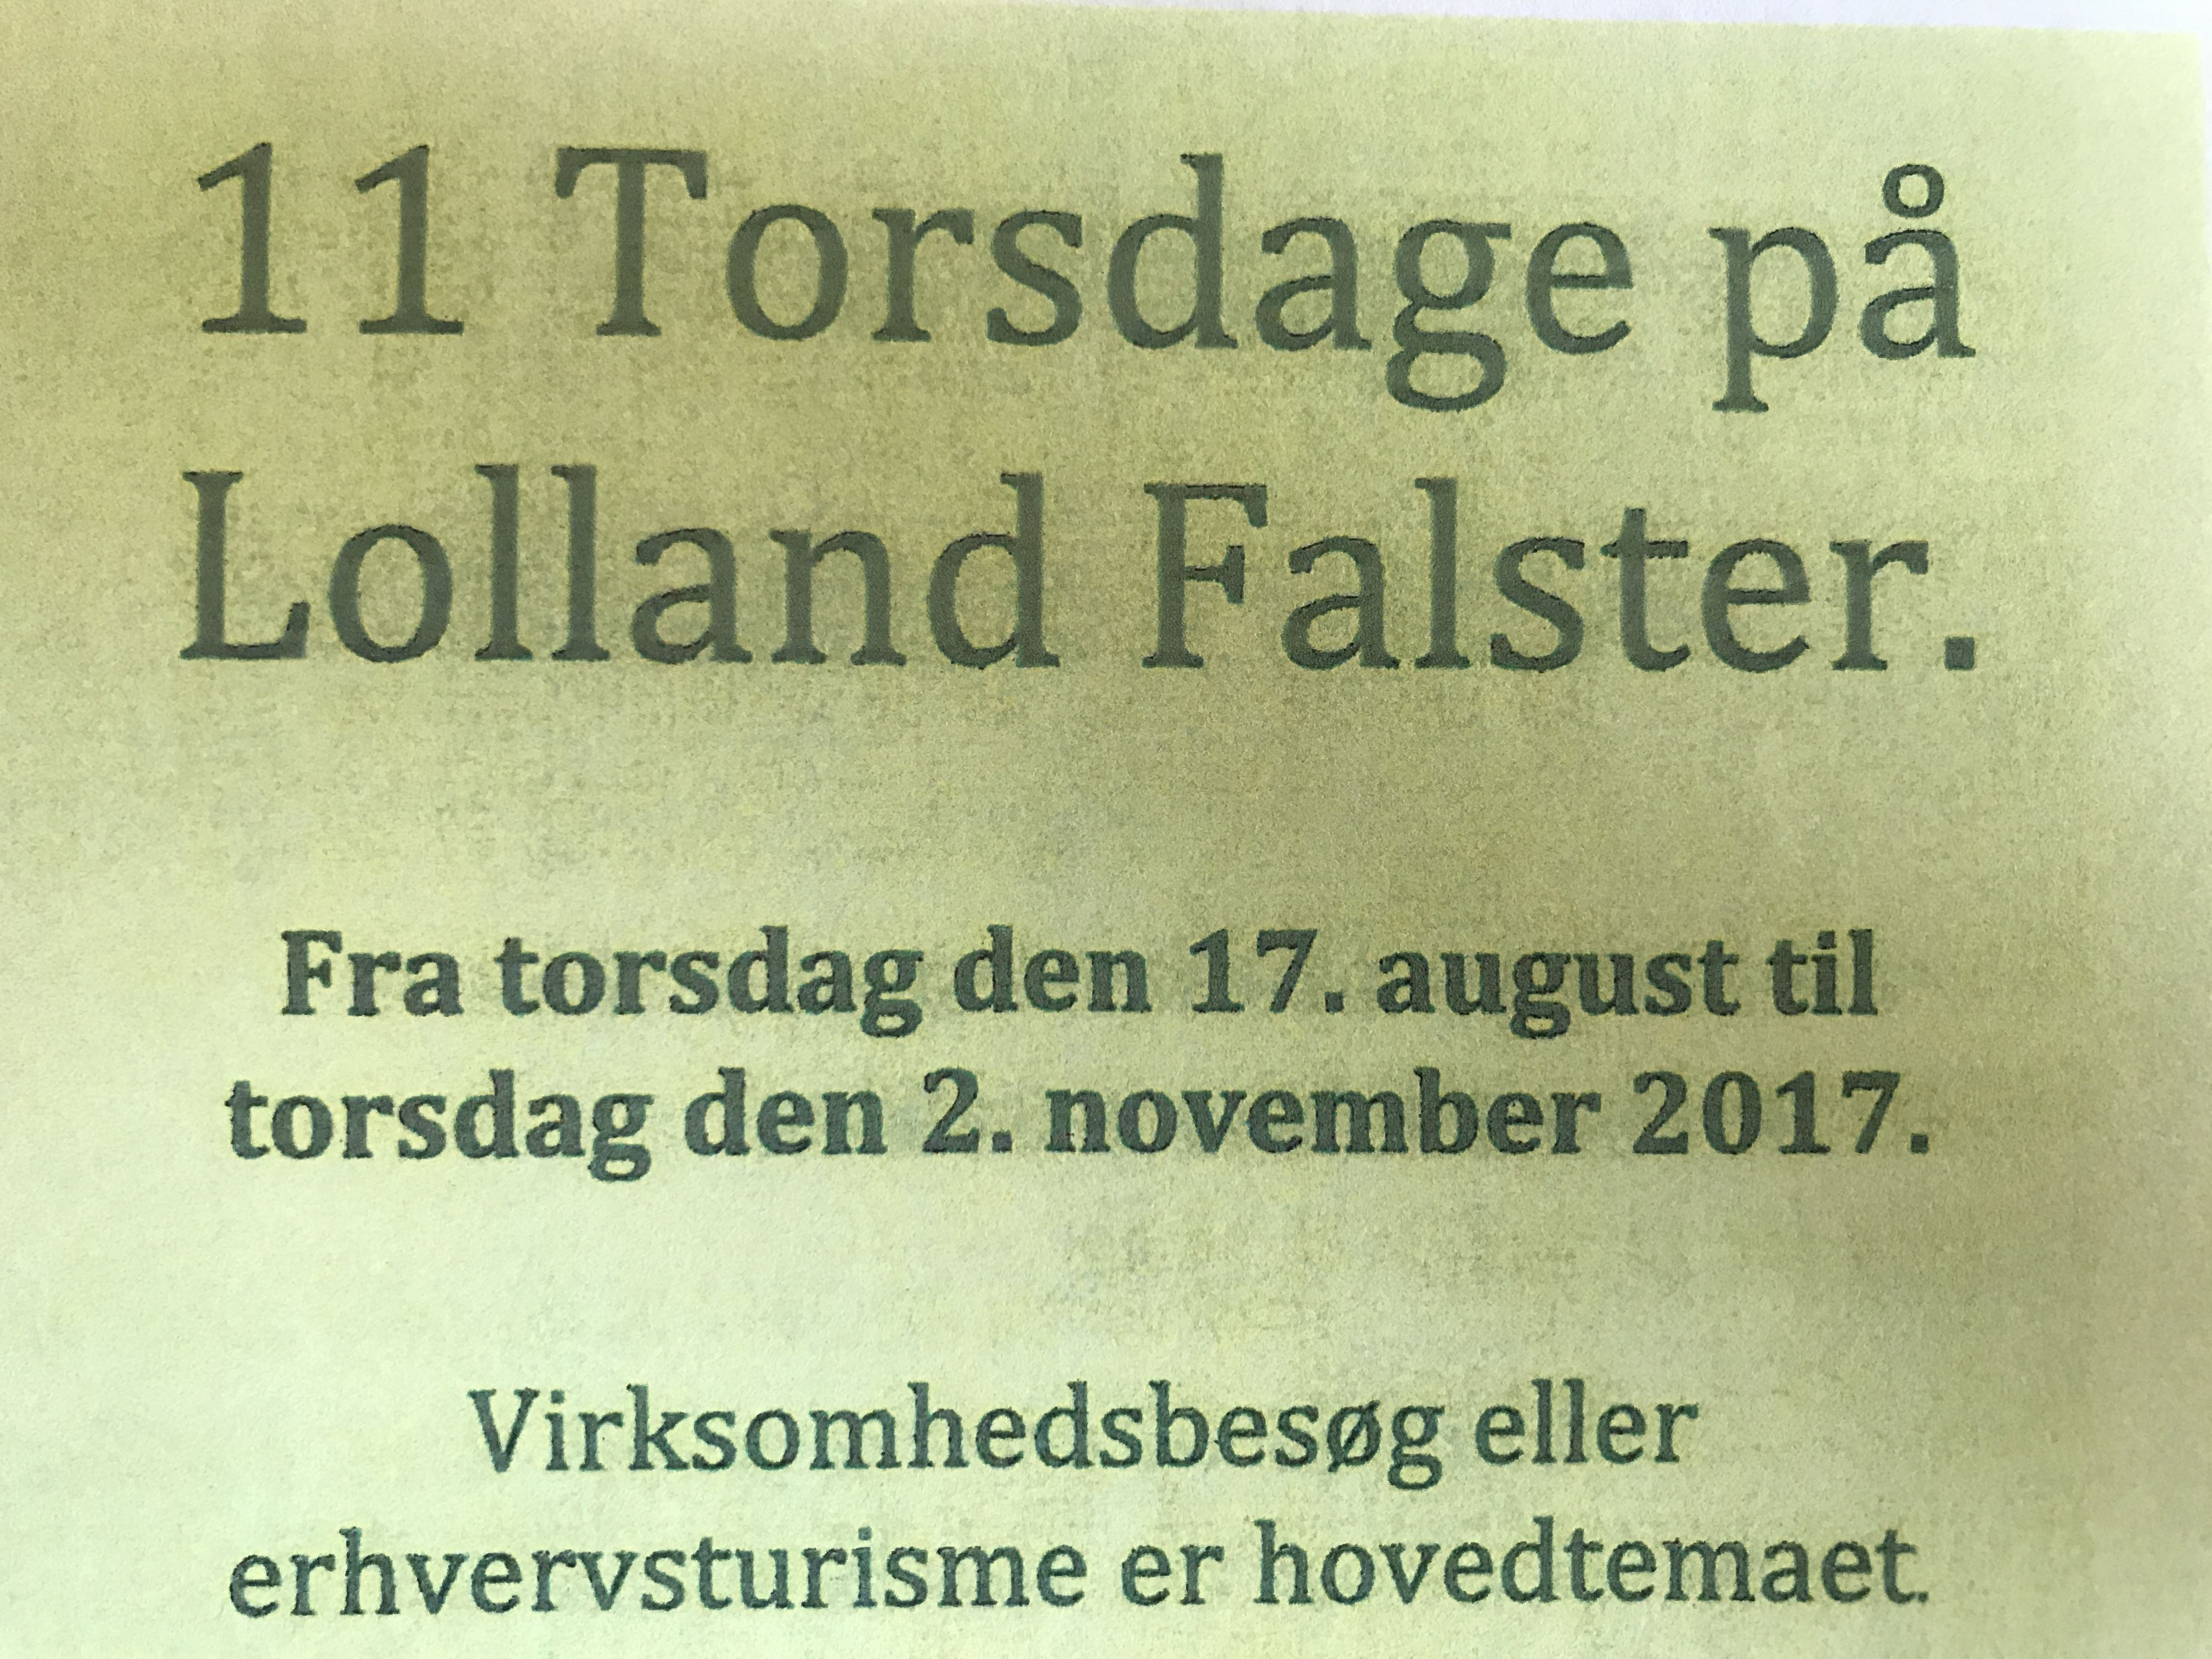 11 torsdage på Lolland Falster - SEiMEi